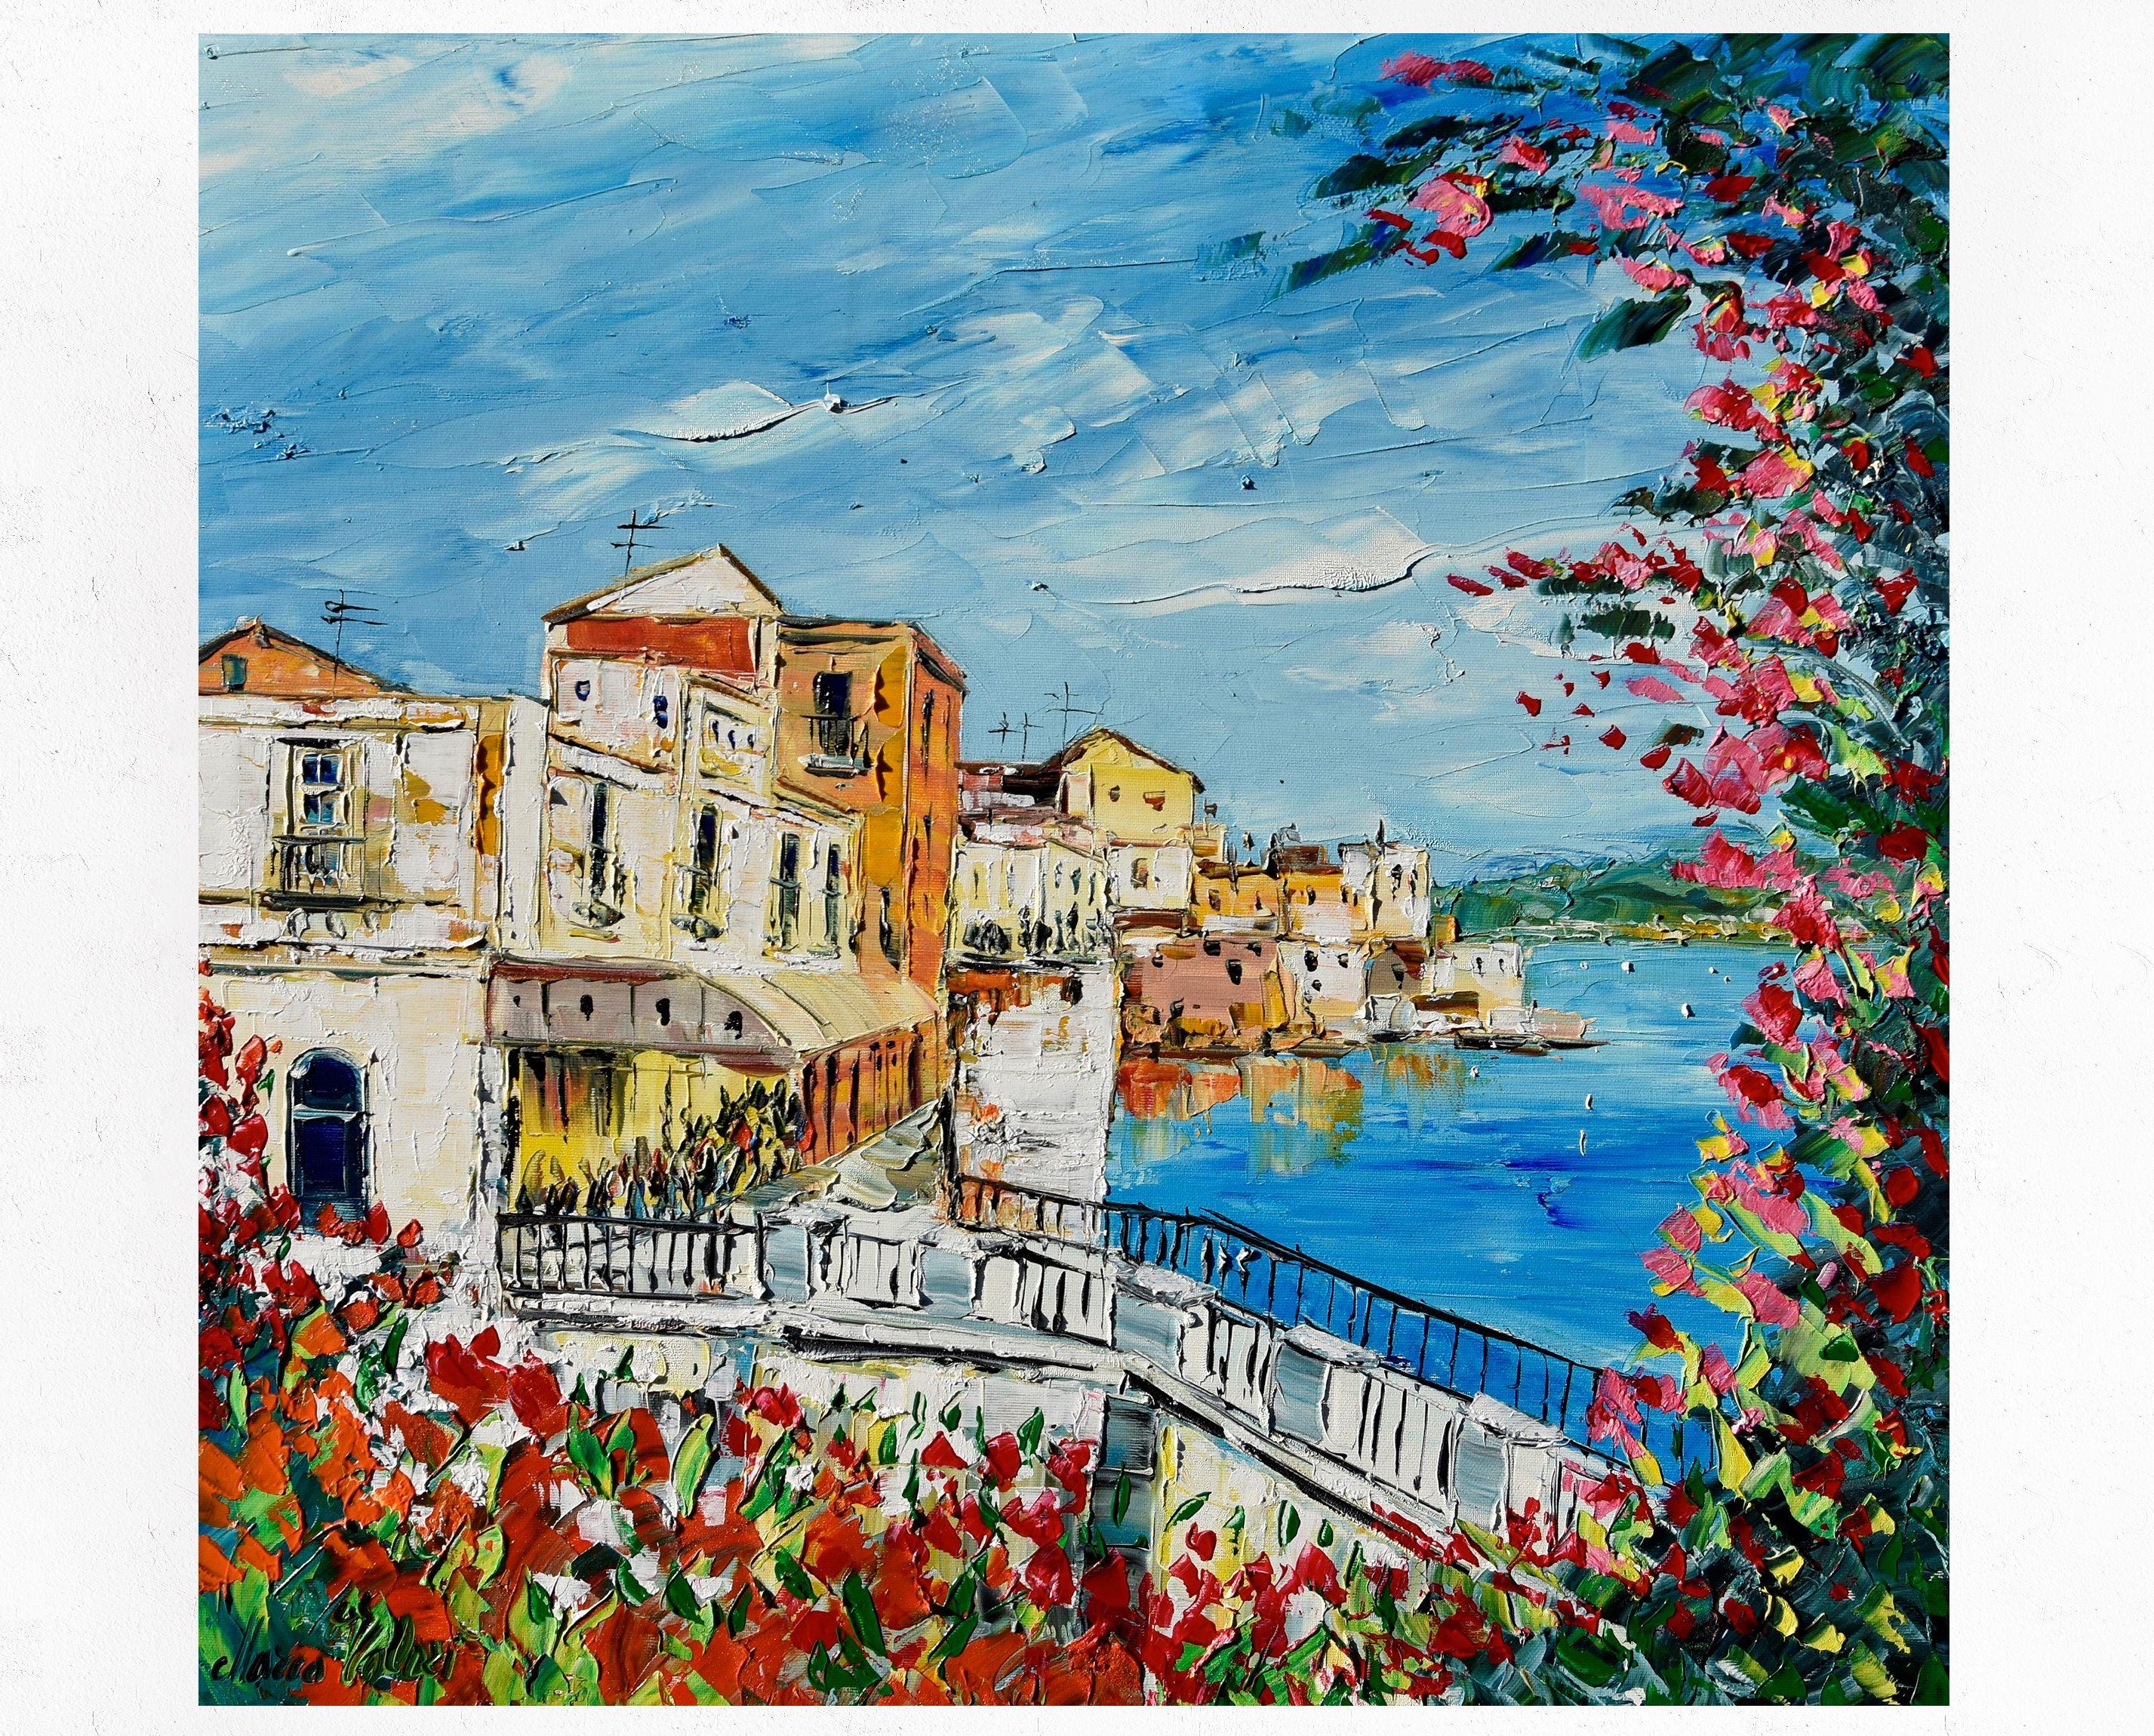 Pittura siciliana su tela, Ortigia, Siracusa, arredamento ...